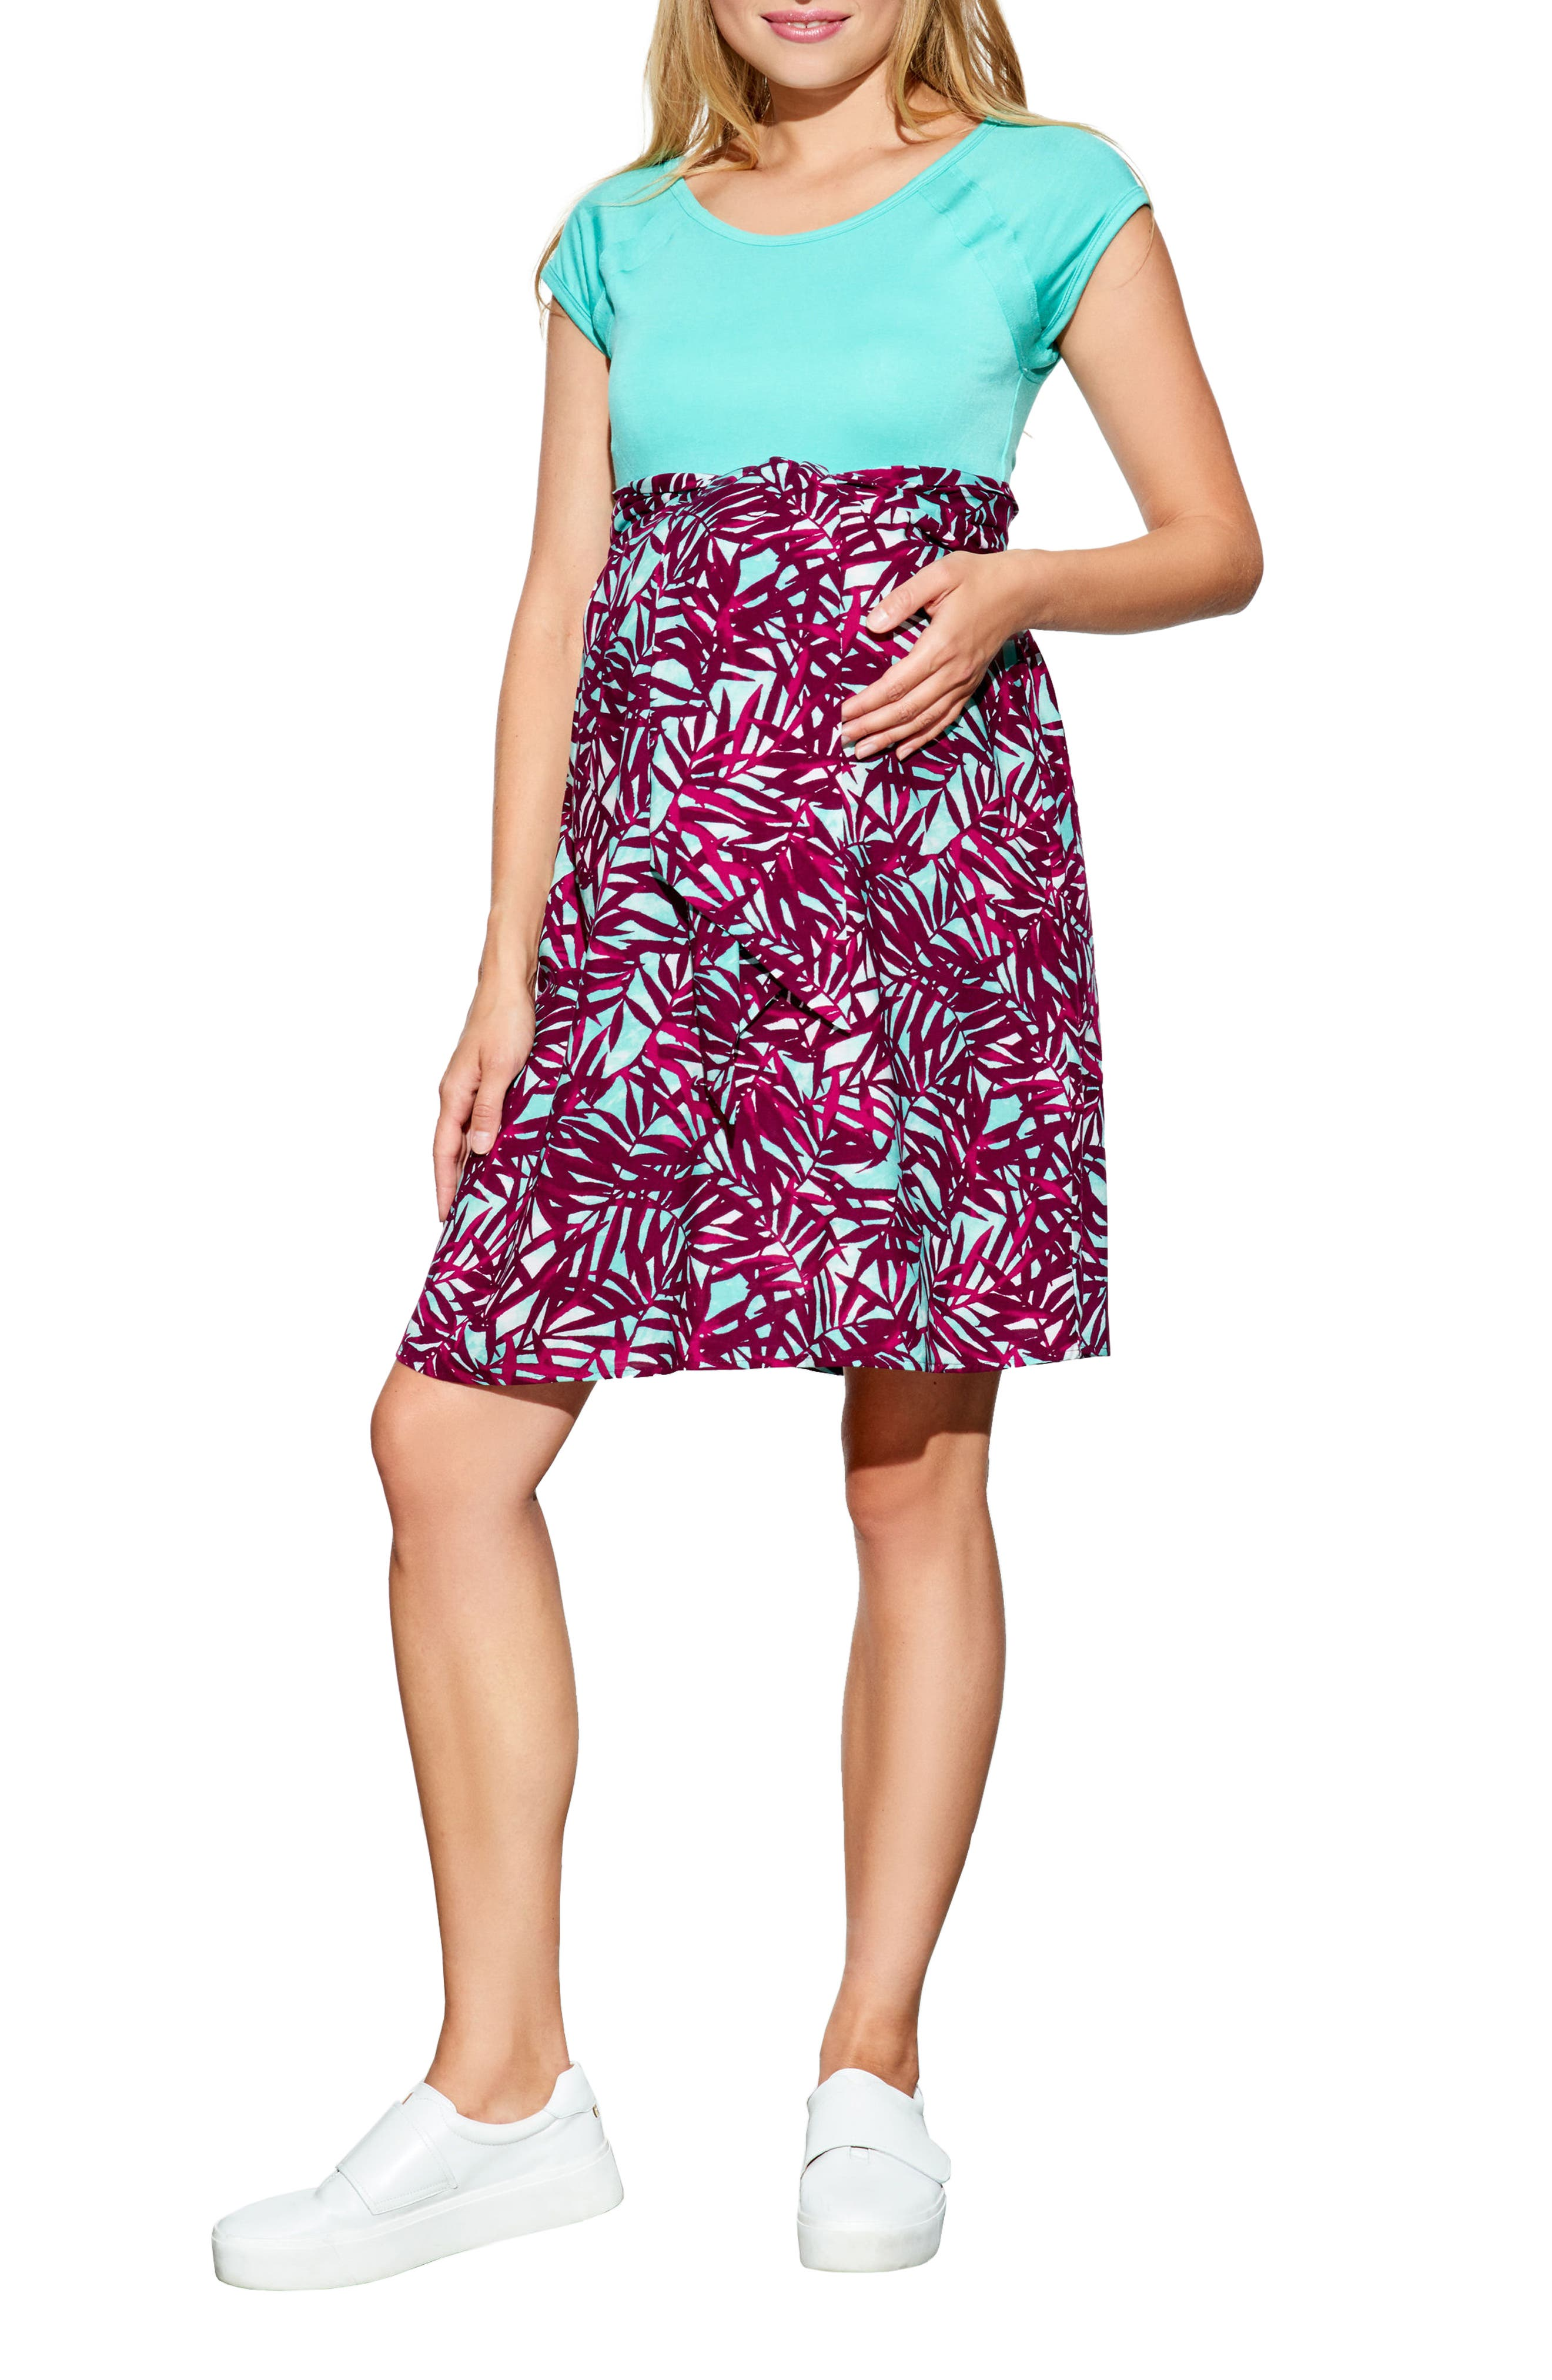 Maternal America Tie Front Maternity Dress, Green